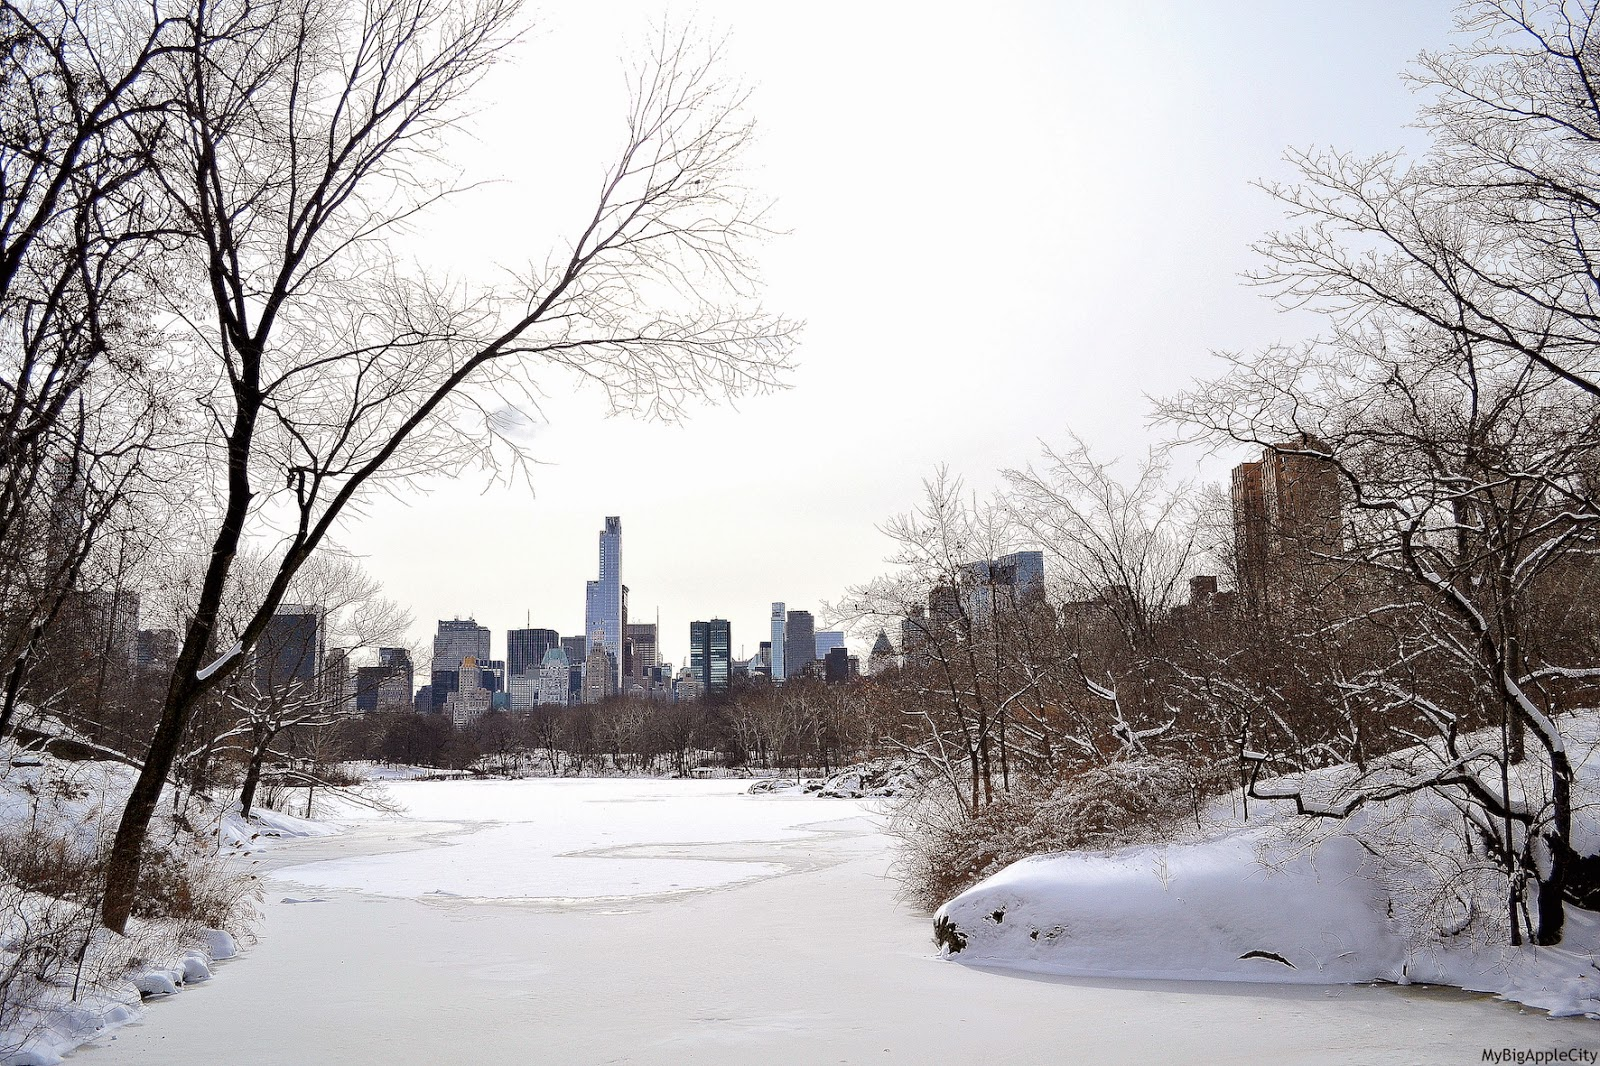 juno-2015-NYC-Blizzard-photo-central-park